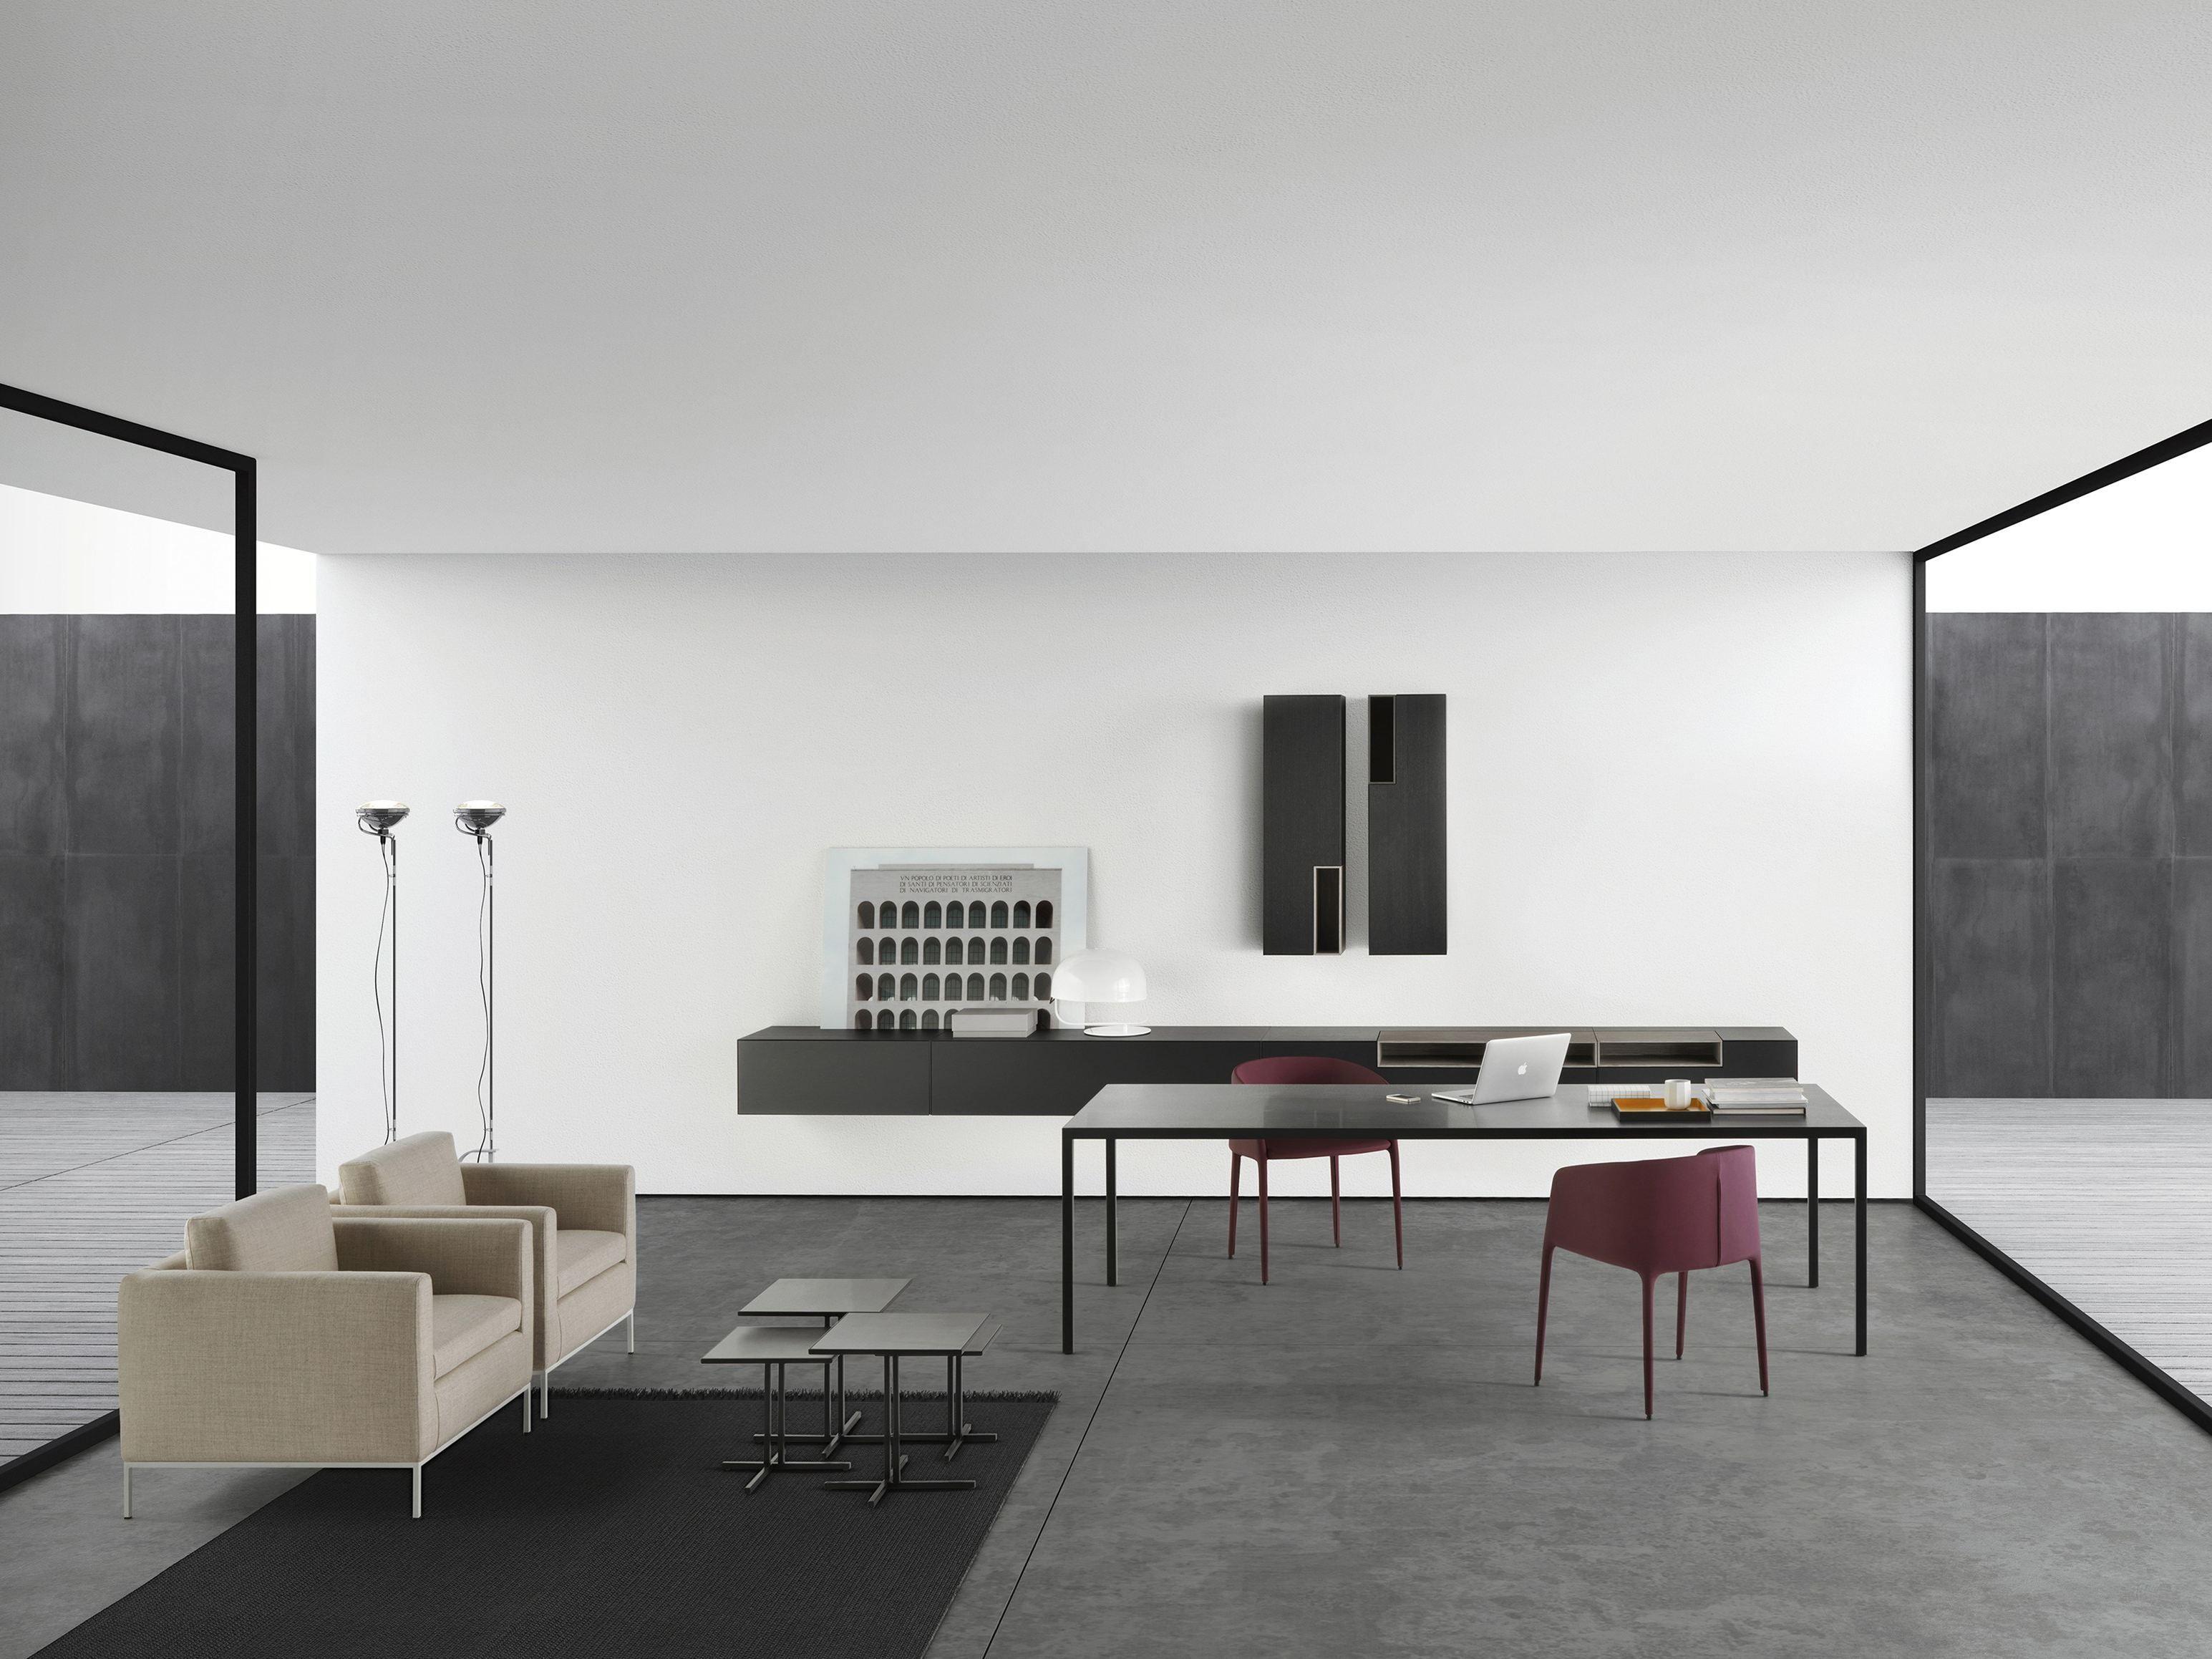 lim 3 0 tisch aus feinsteinzeug kollektion lim 3 0 by mdf italia design fattorini rizzini partners. Black Bedroom Furniture Sets. Home Design Ideas